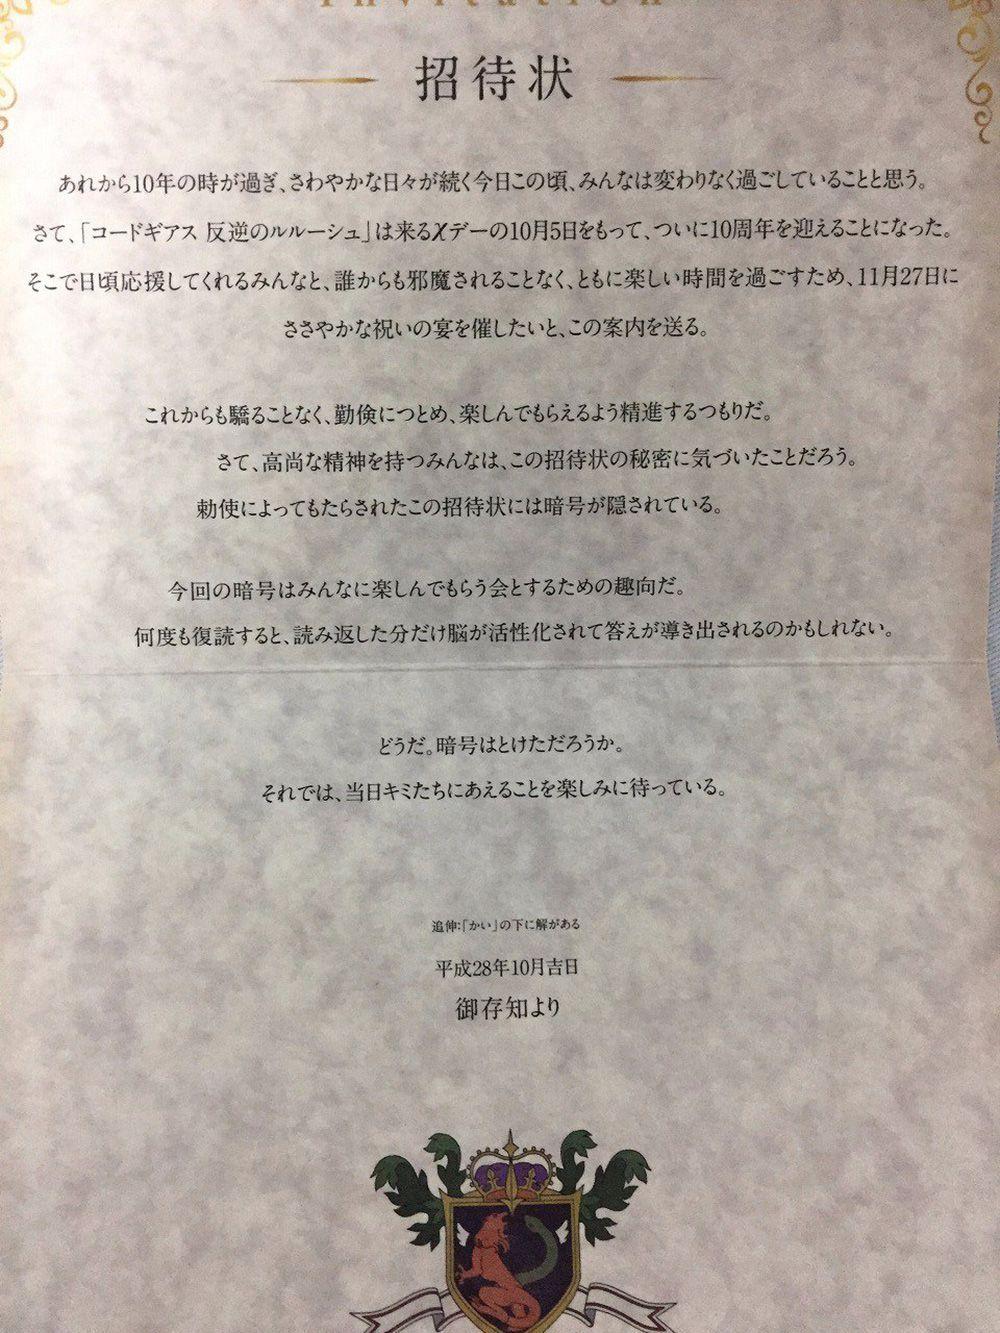 code-geass-10th-anniversary-event-invitation-message